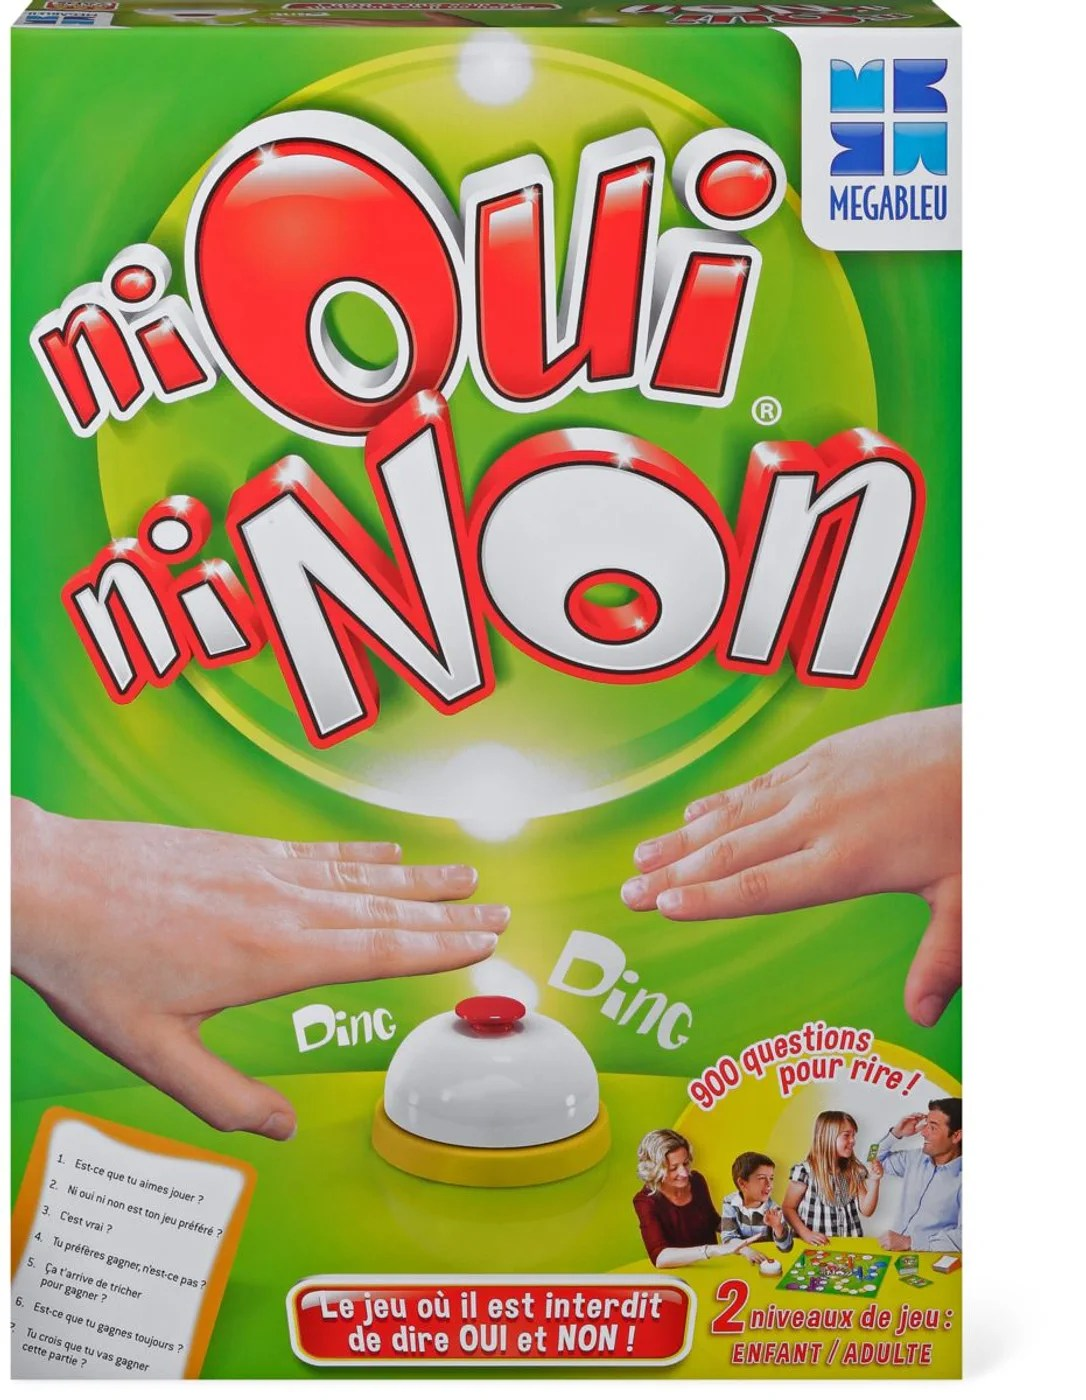 Jeux De Ni Oui Ni Non : Société, Migros